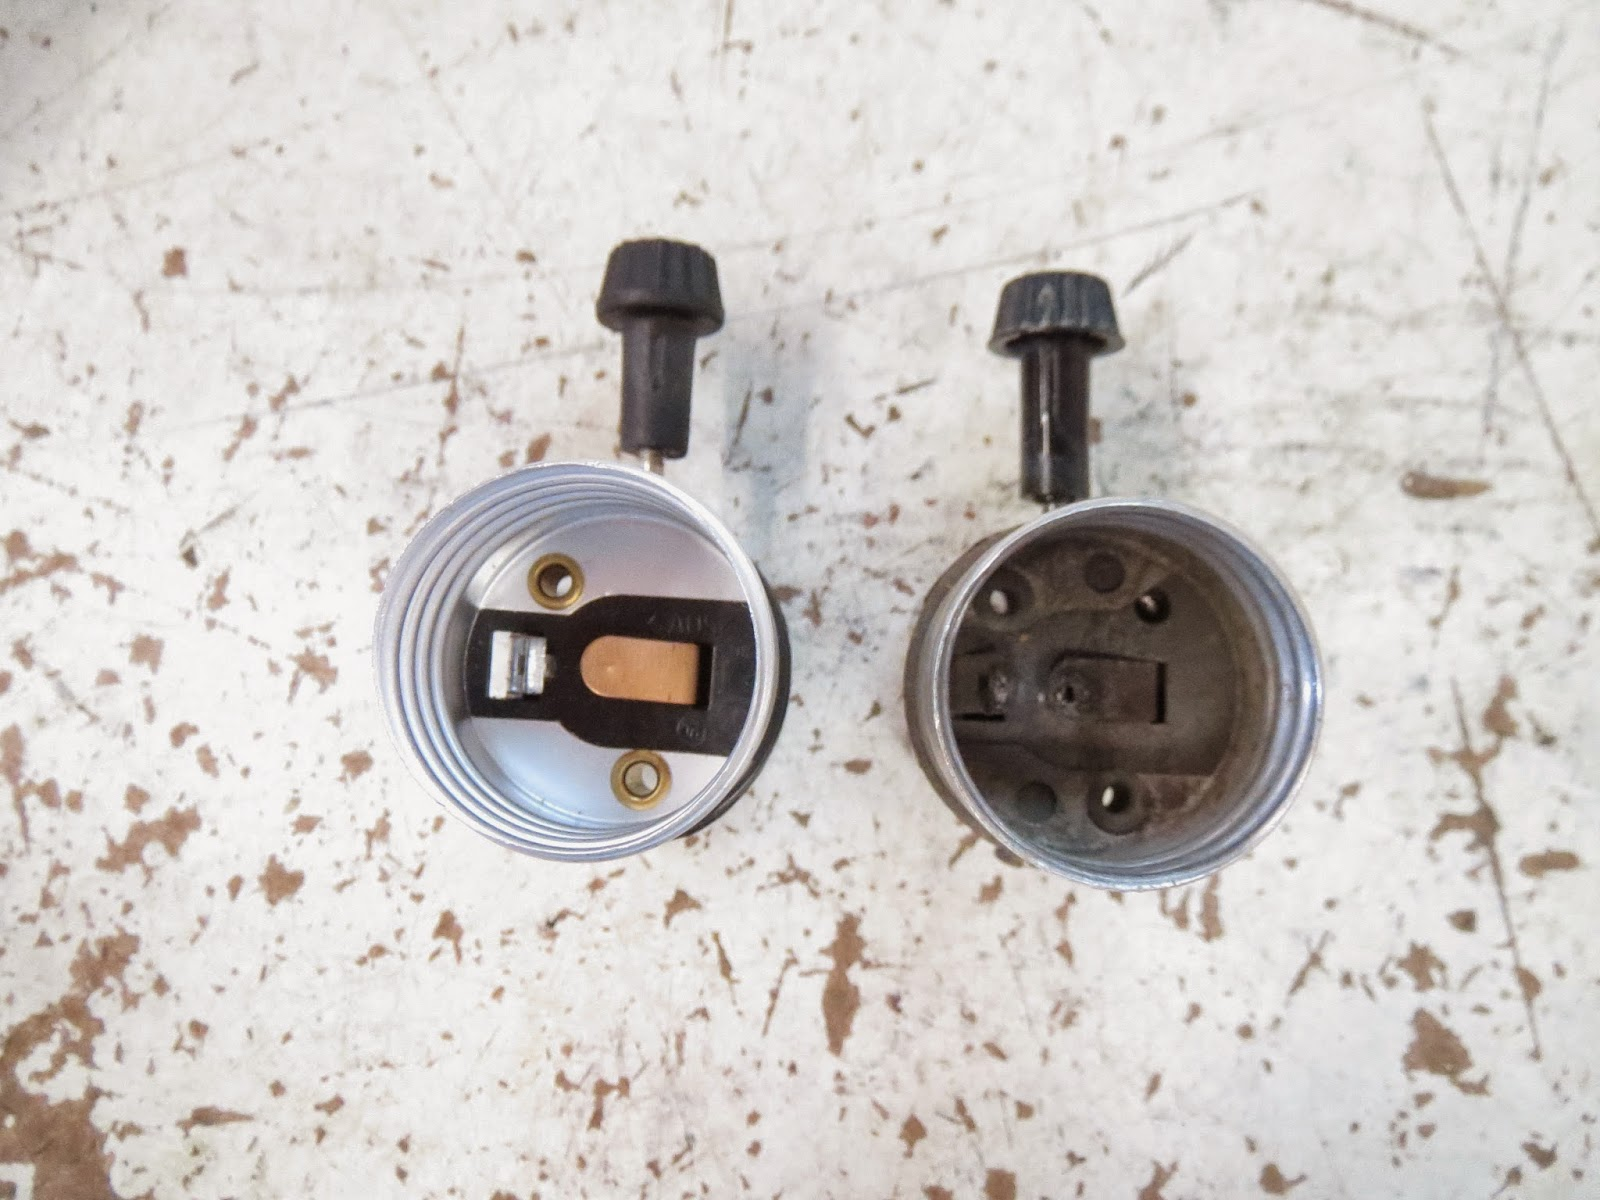 aa_8705] edis ignition wiring diagram on 3 way touch lamp switch wiring  diagram download diagram  inki awni targ adit osuri cette mohammedshrine librar wiring 101